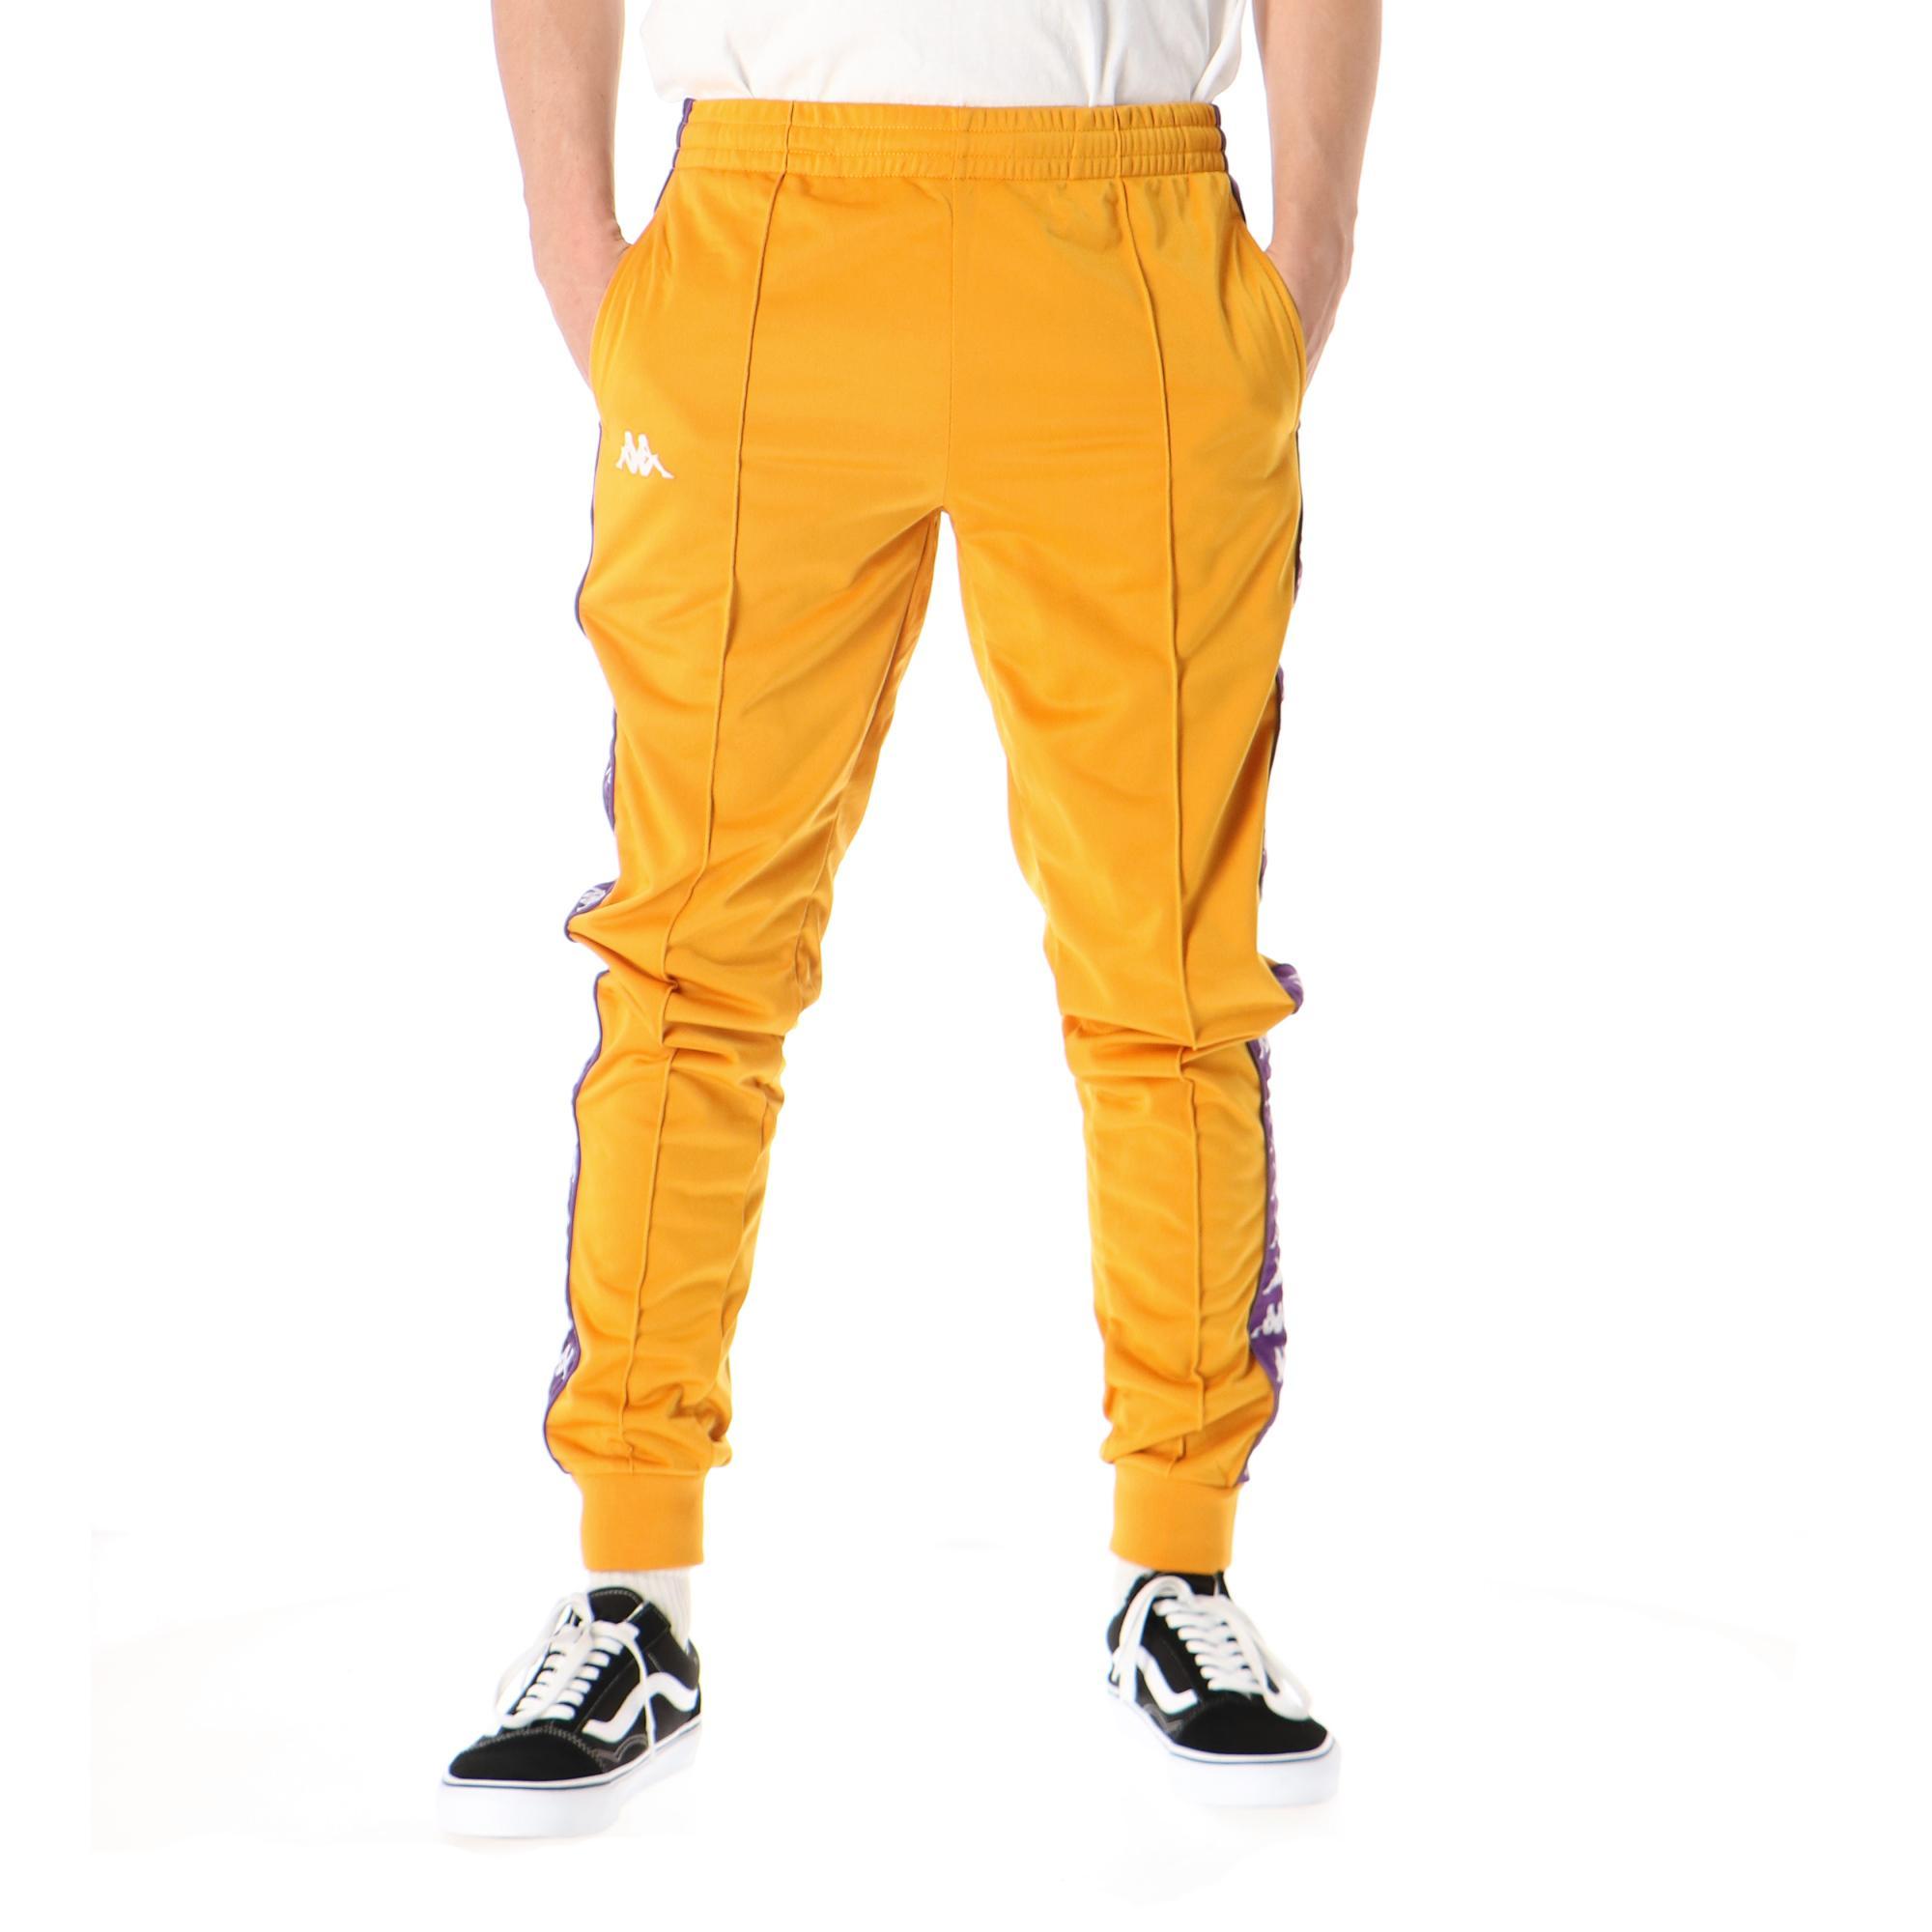 Kappa 222 Banda Rastoria Slim Yellow ochre violet white